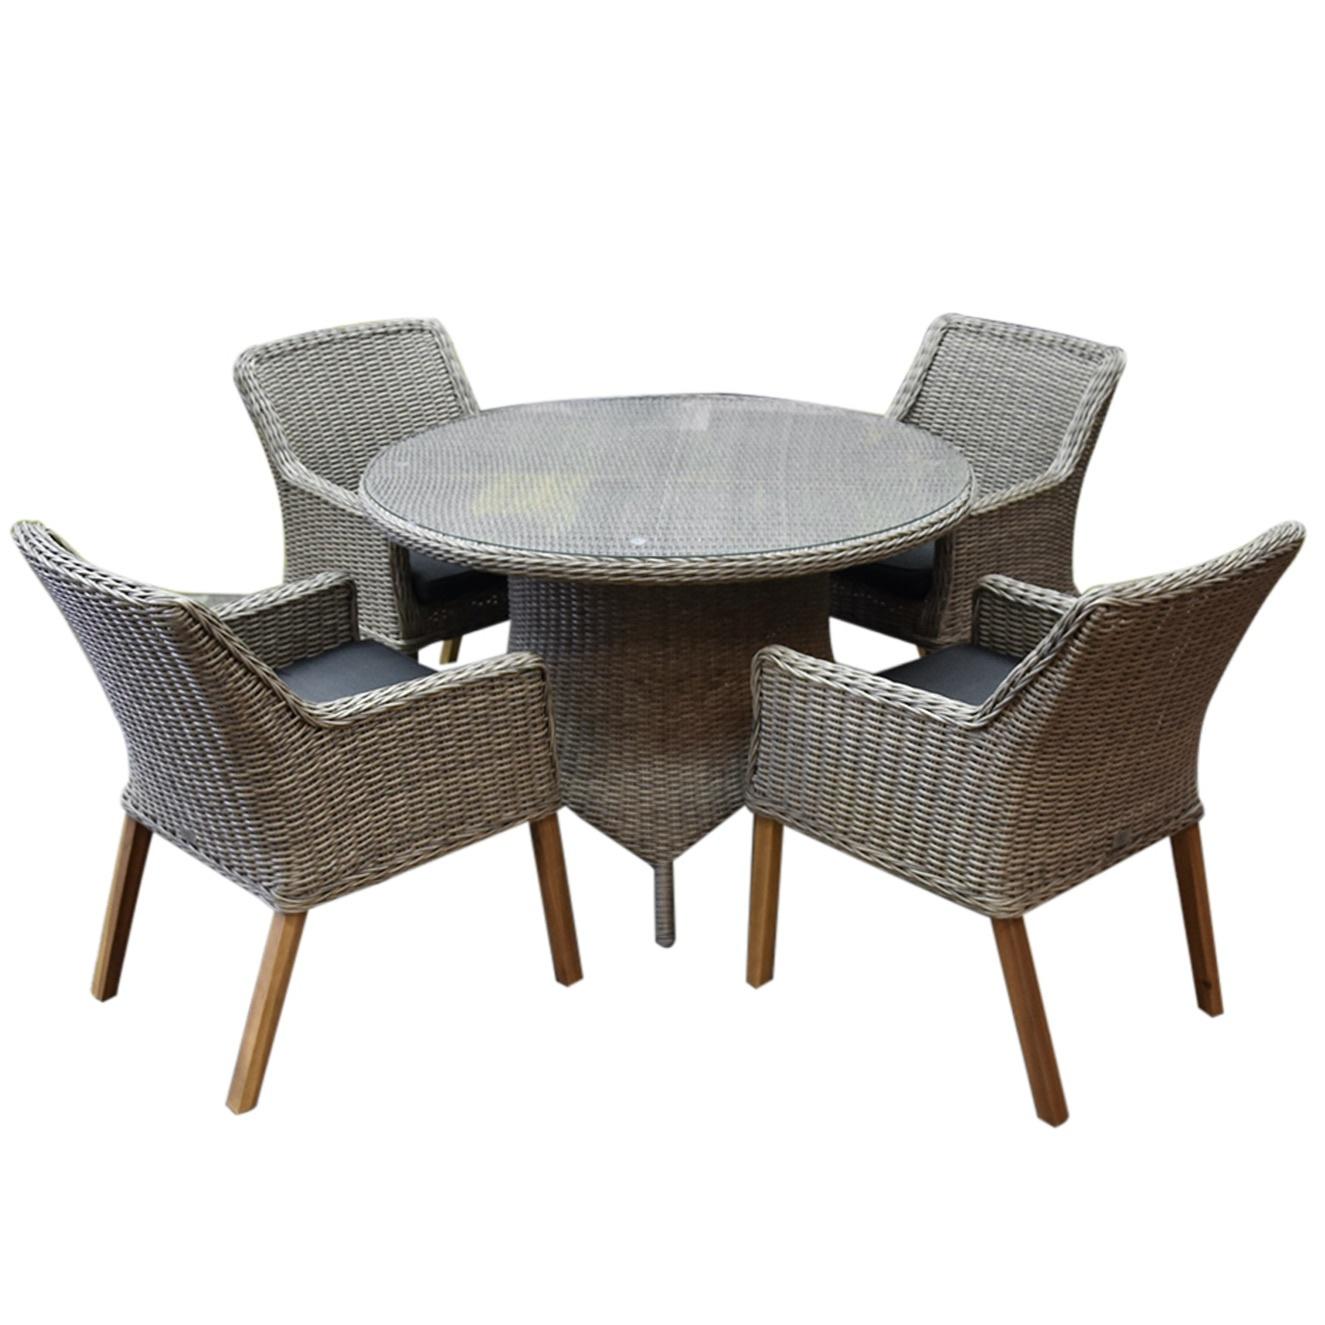 Ponte wooden legs Riccione dining tuinset 110 cm 5-delig grijs